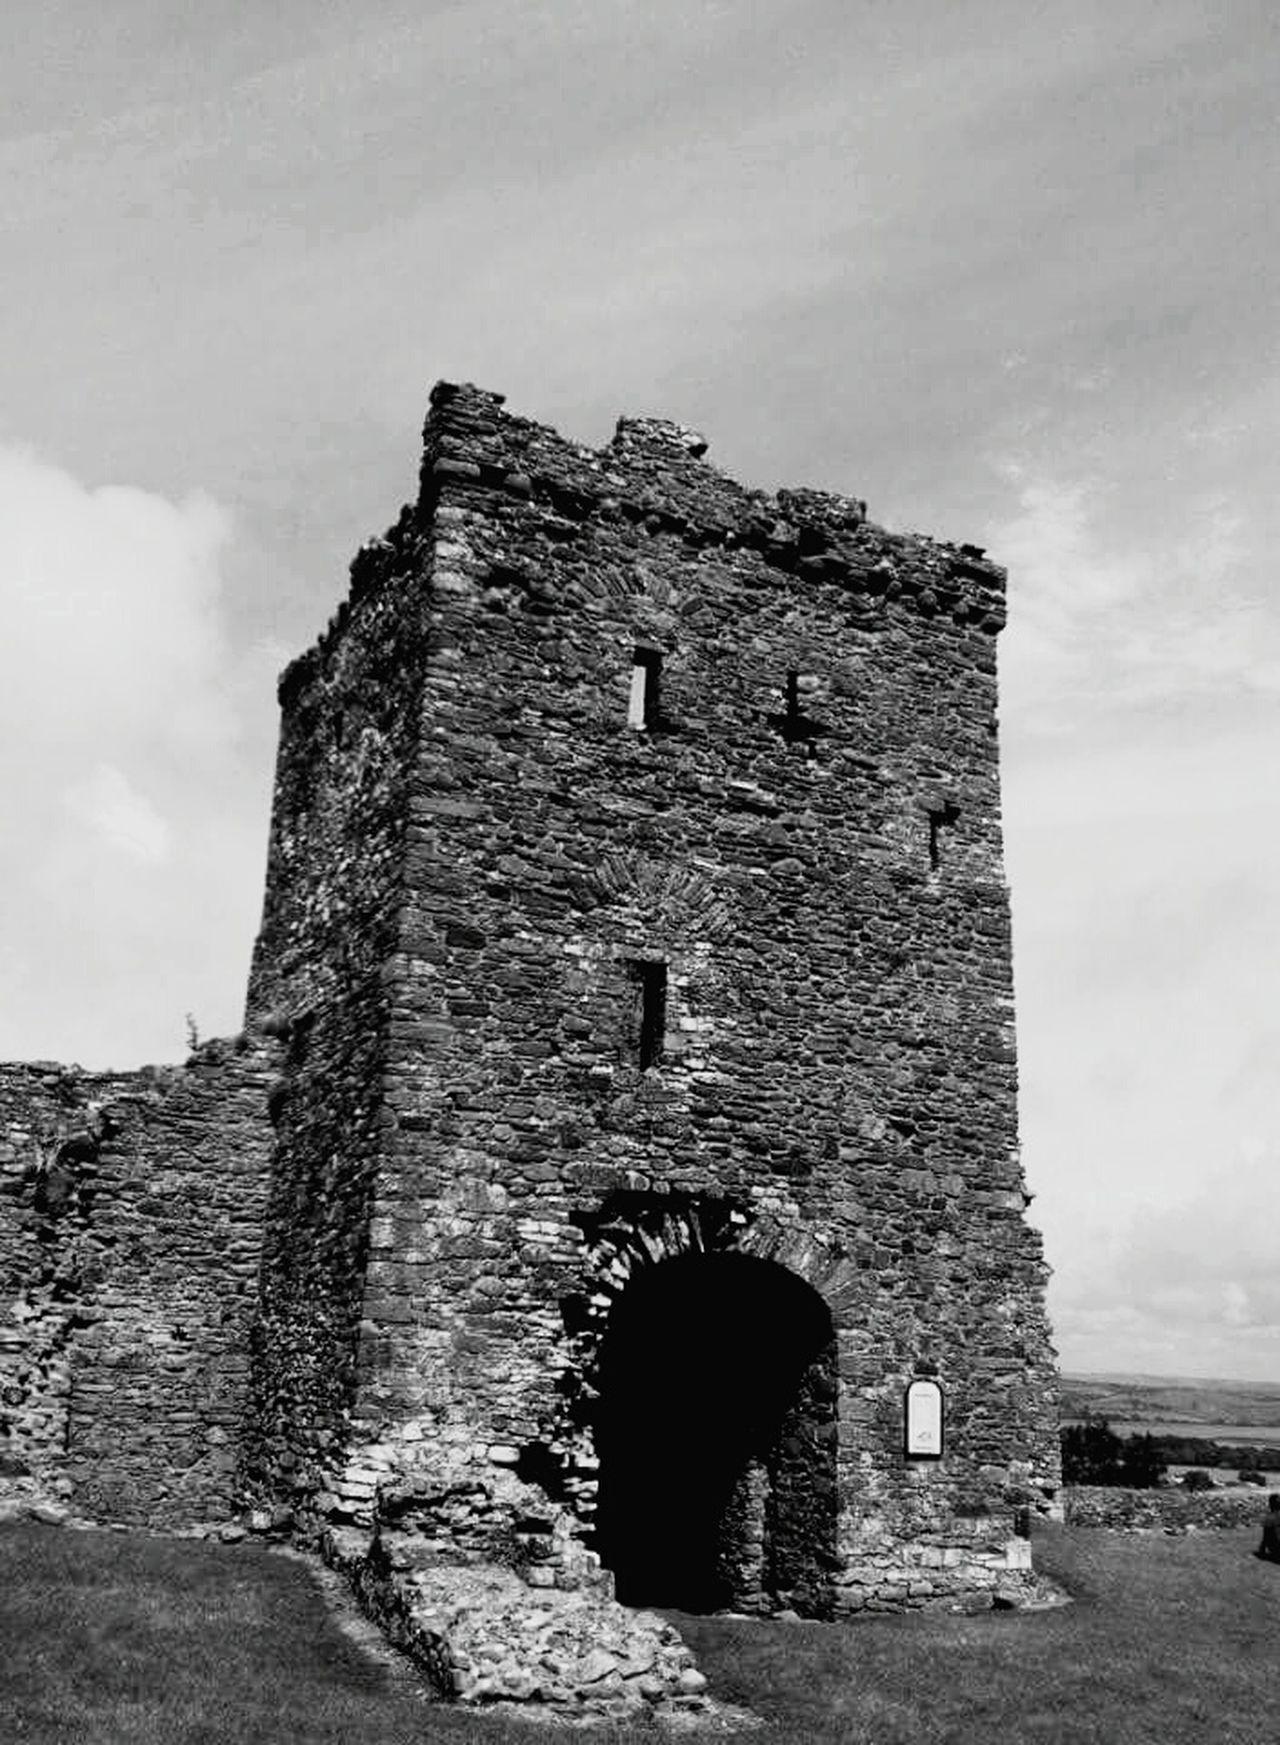 Llansteffan Castle Naturescape Natural Scenery Scenic View Blackandwhite Beautiful Towers Castles